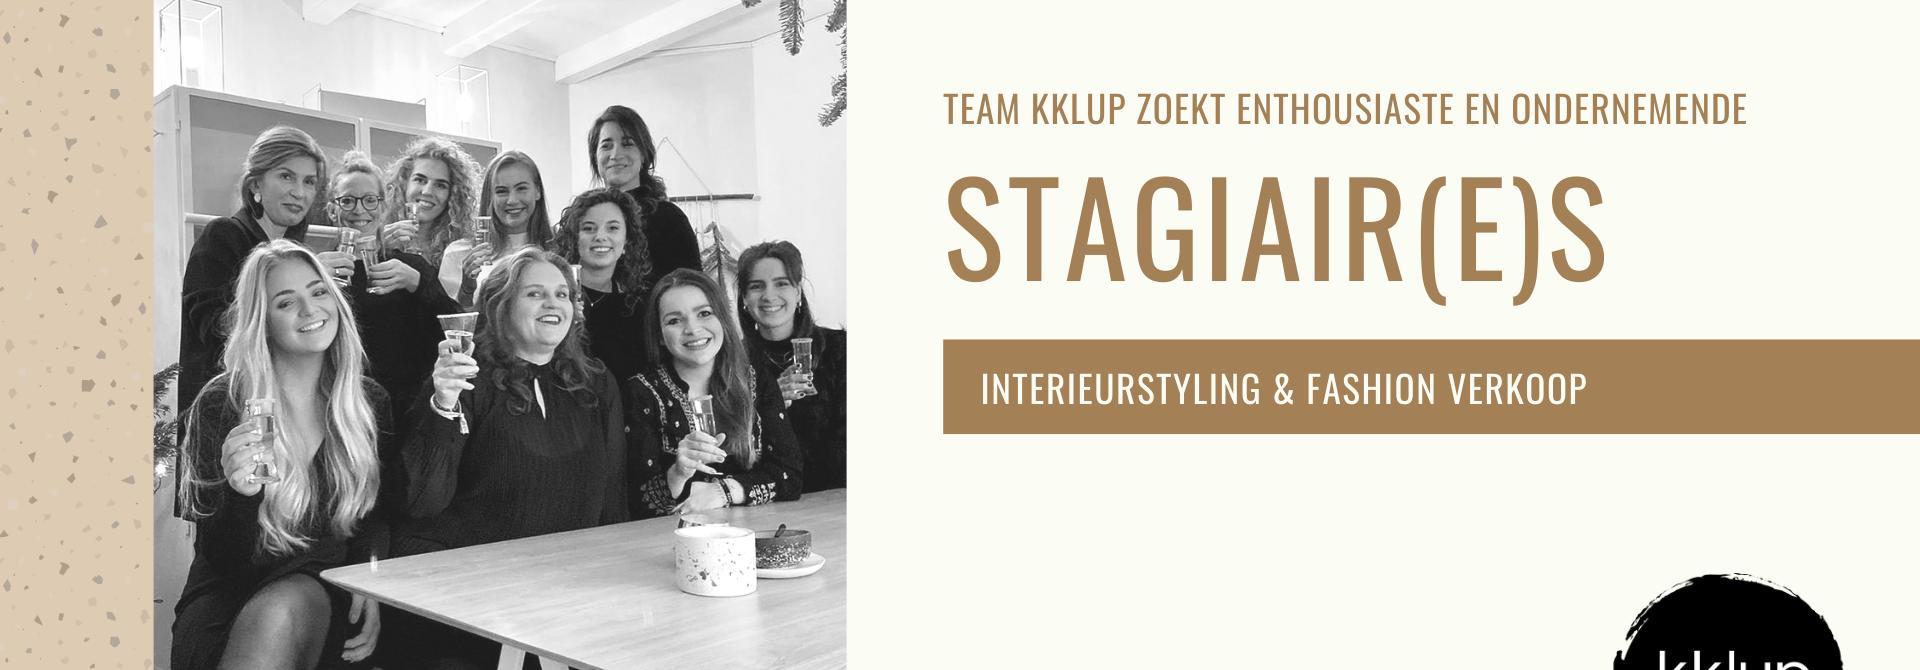 Kklup zoekt enthousiaste en ondernemende stagiair(e)s (Interieurstyling & Fashion Verkoop)